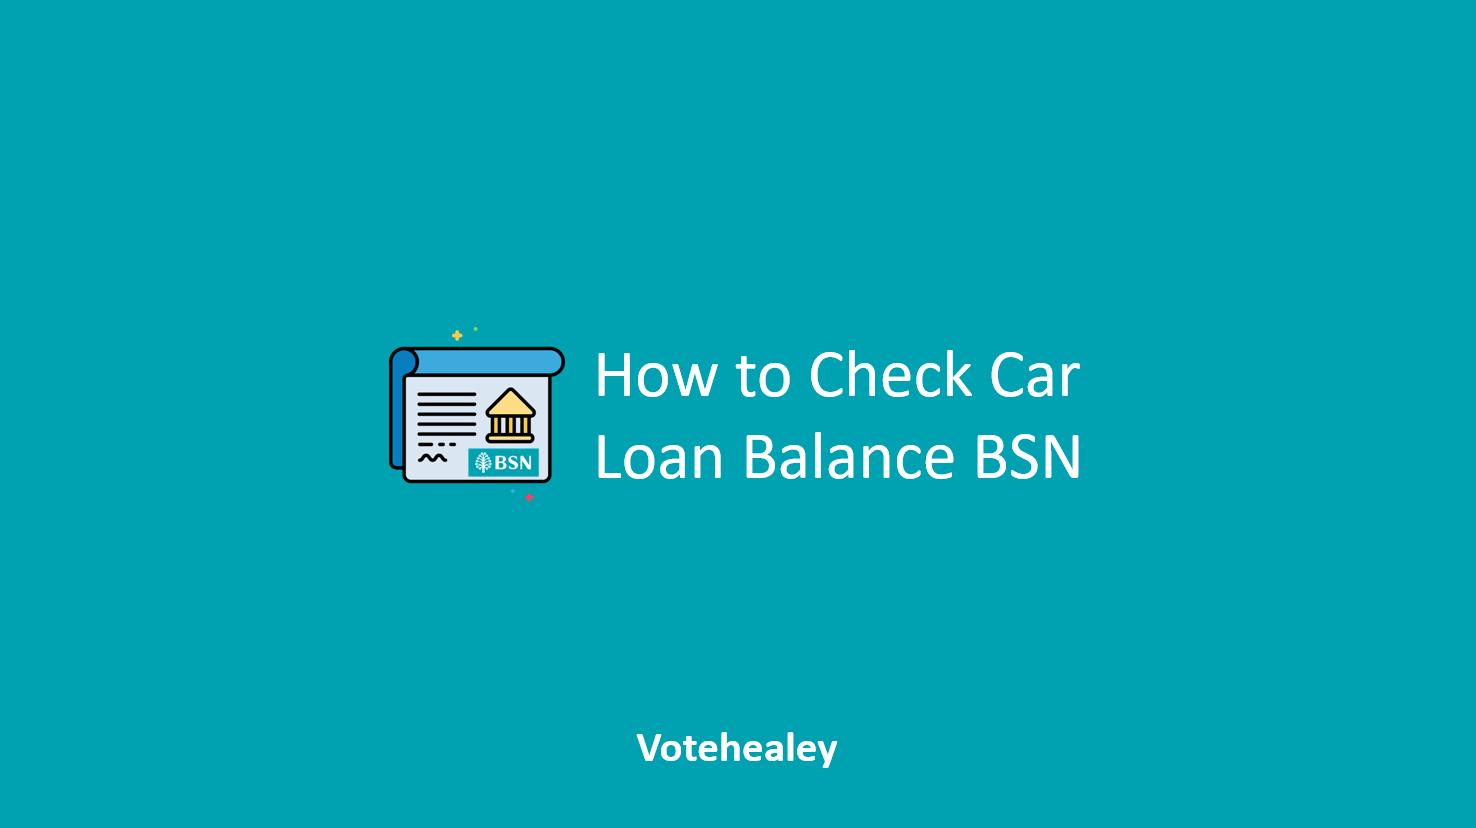 How to Check Car Loan Balance BSN